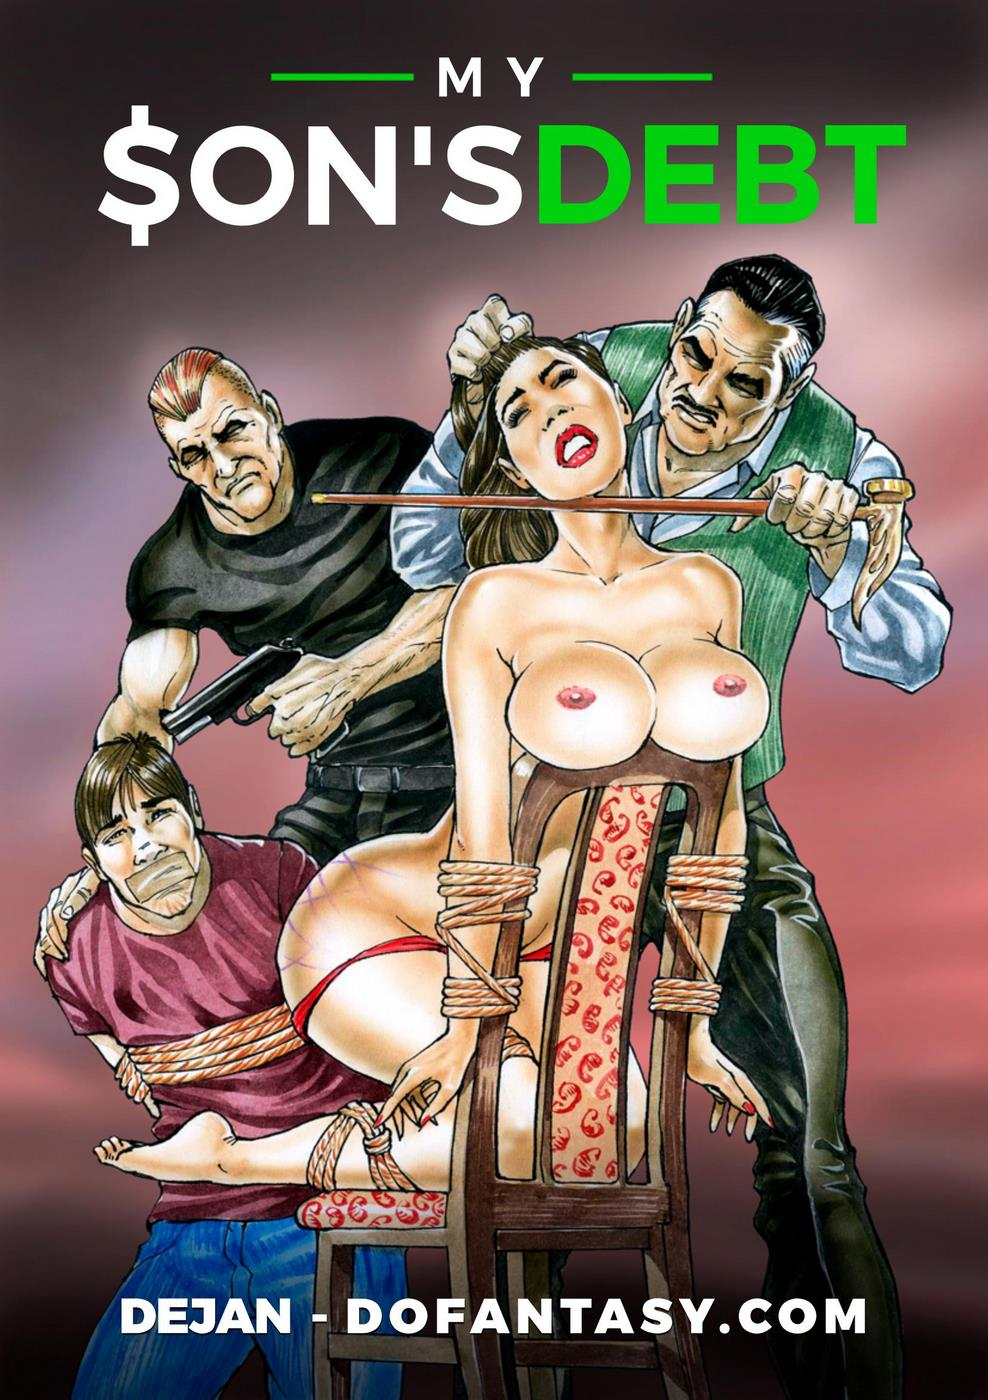 Forced Comic Porn dofantasy] - dejan – my son's debt | porn comics